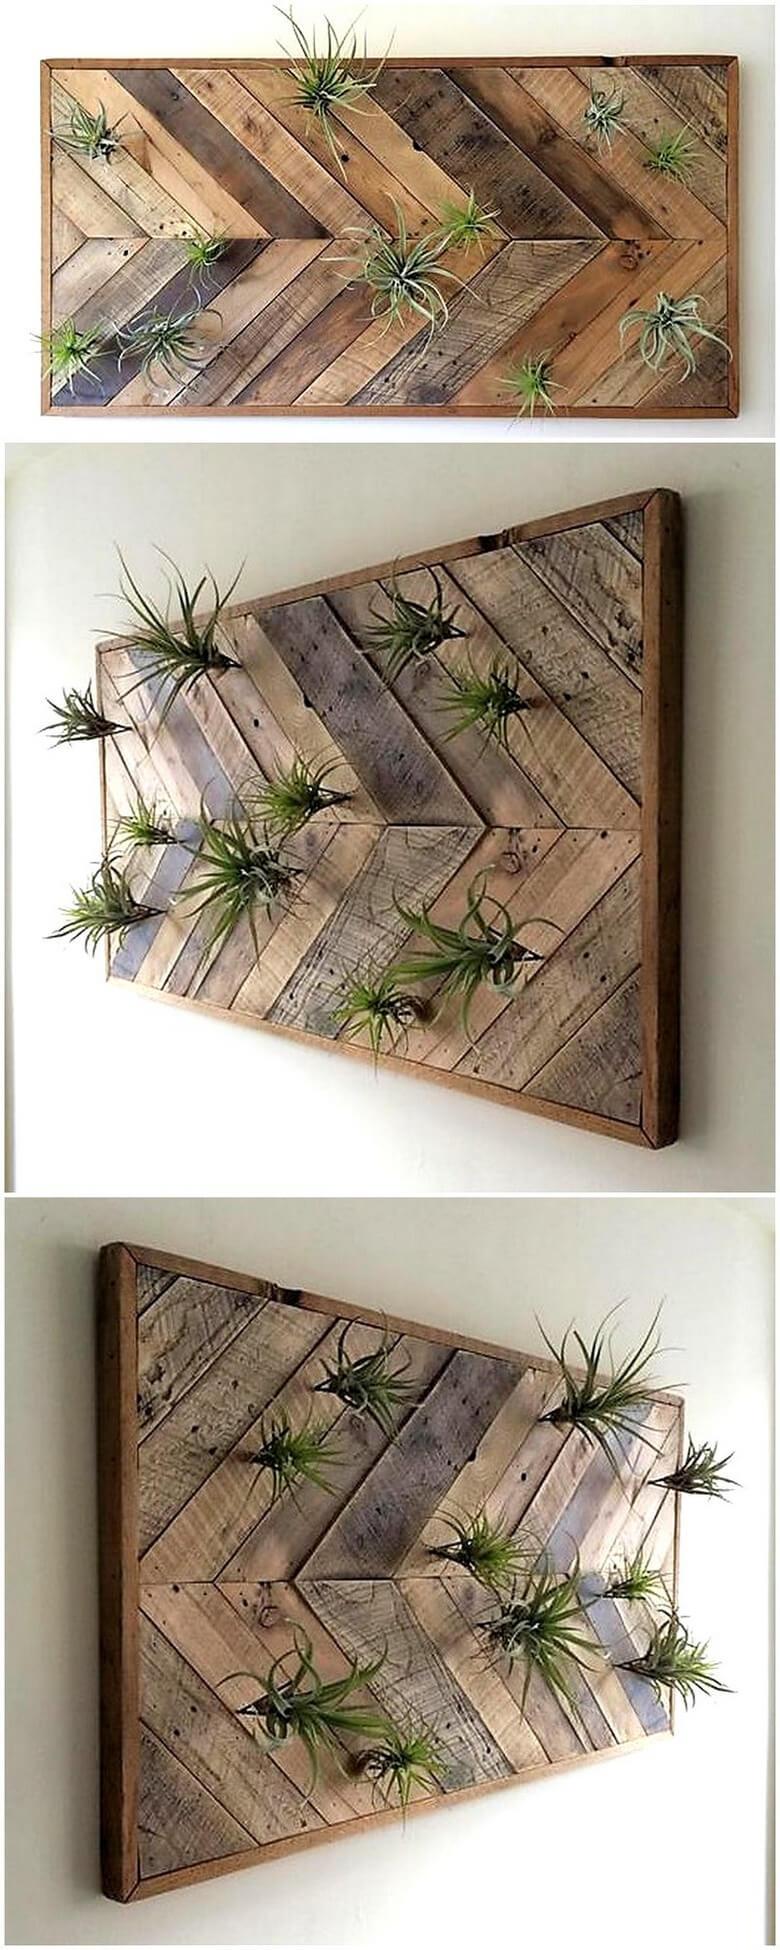 Wood Pallet Wall Decor Art Idea Diy Motive